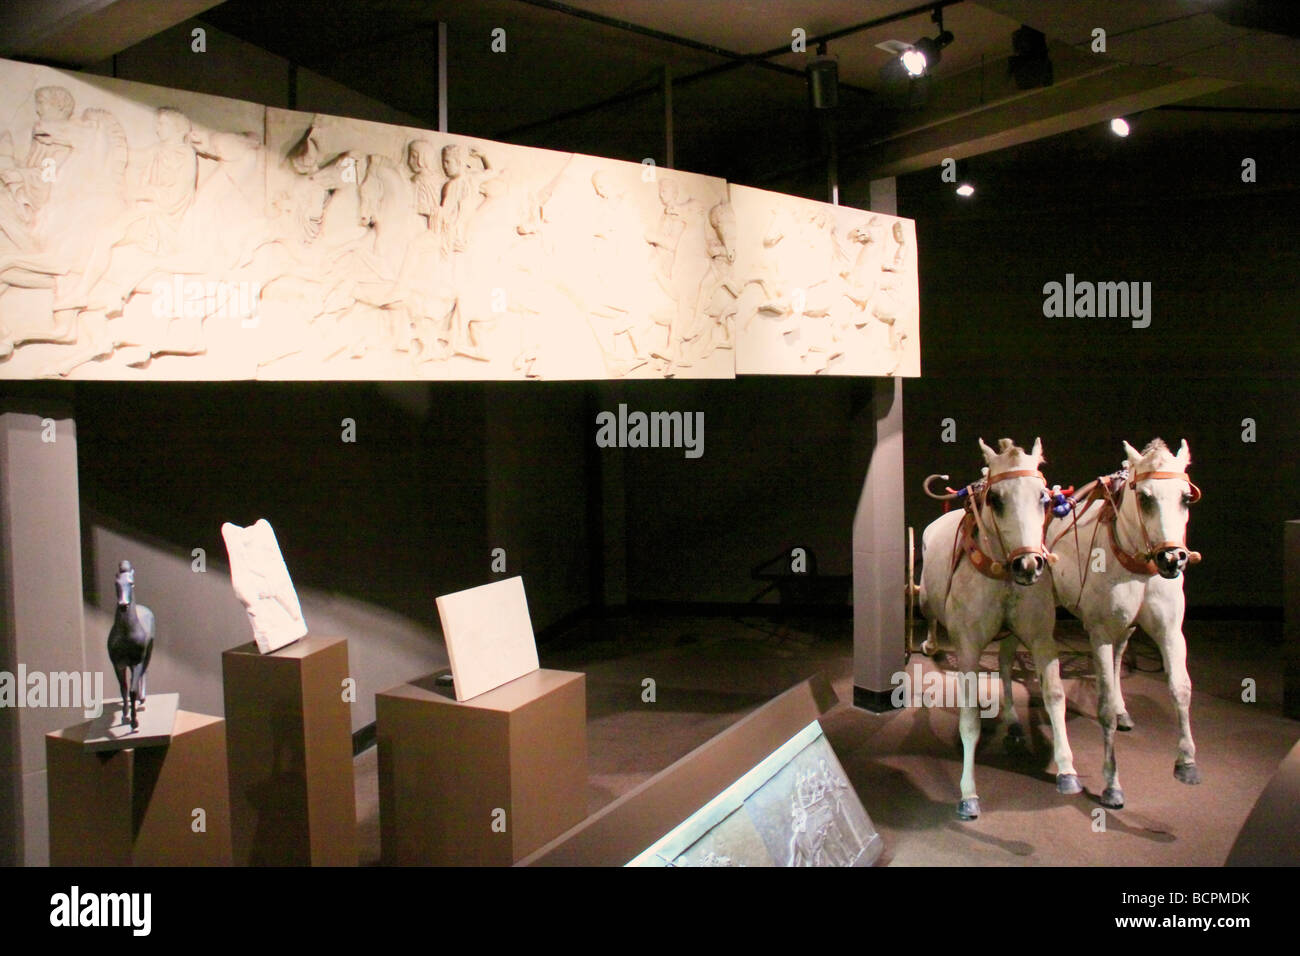 Exhibit in the International Museum of the Horse Kentucky Horse Park Lexington Kentucky - Stock Image